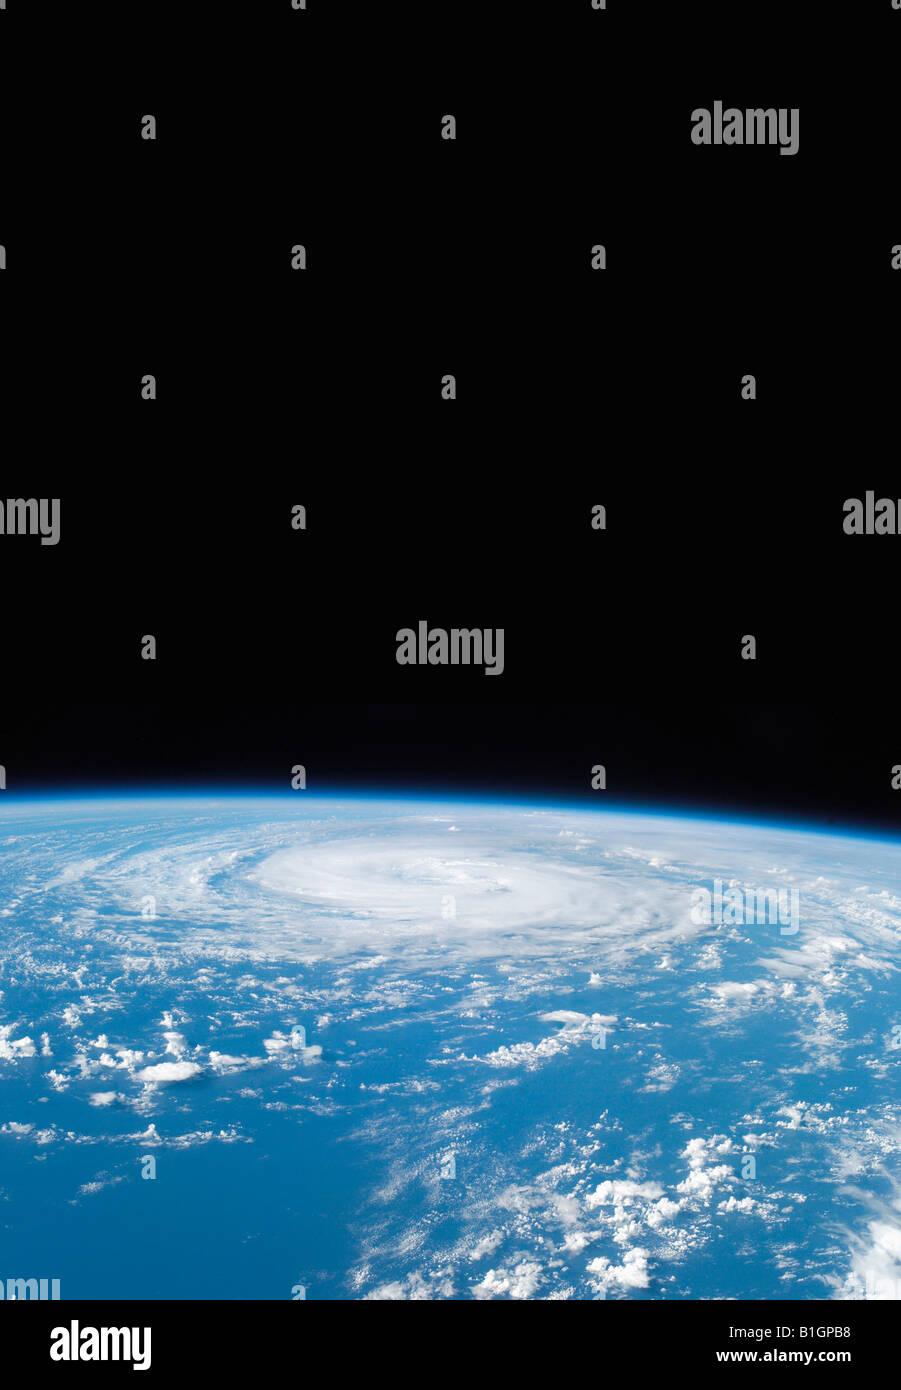 Hurrikan-Epsilon aus dem Weltraum Stockbild